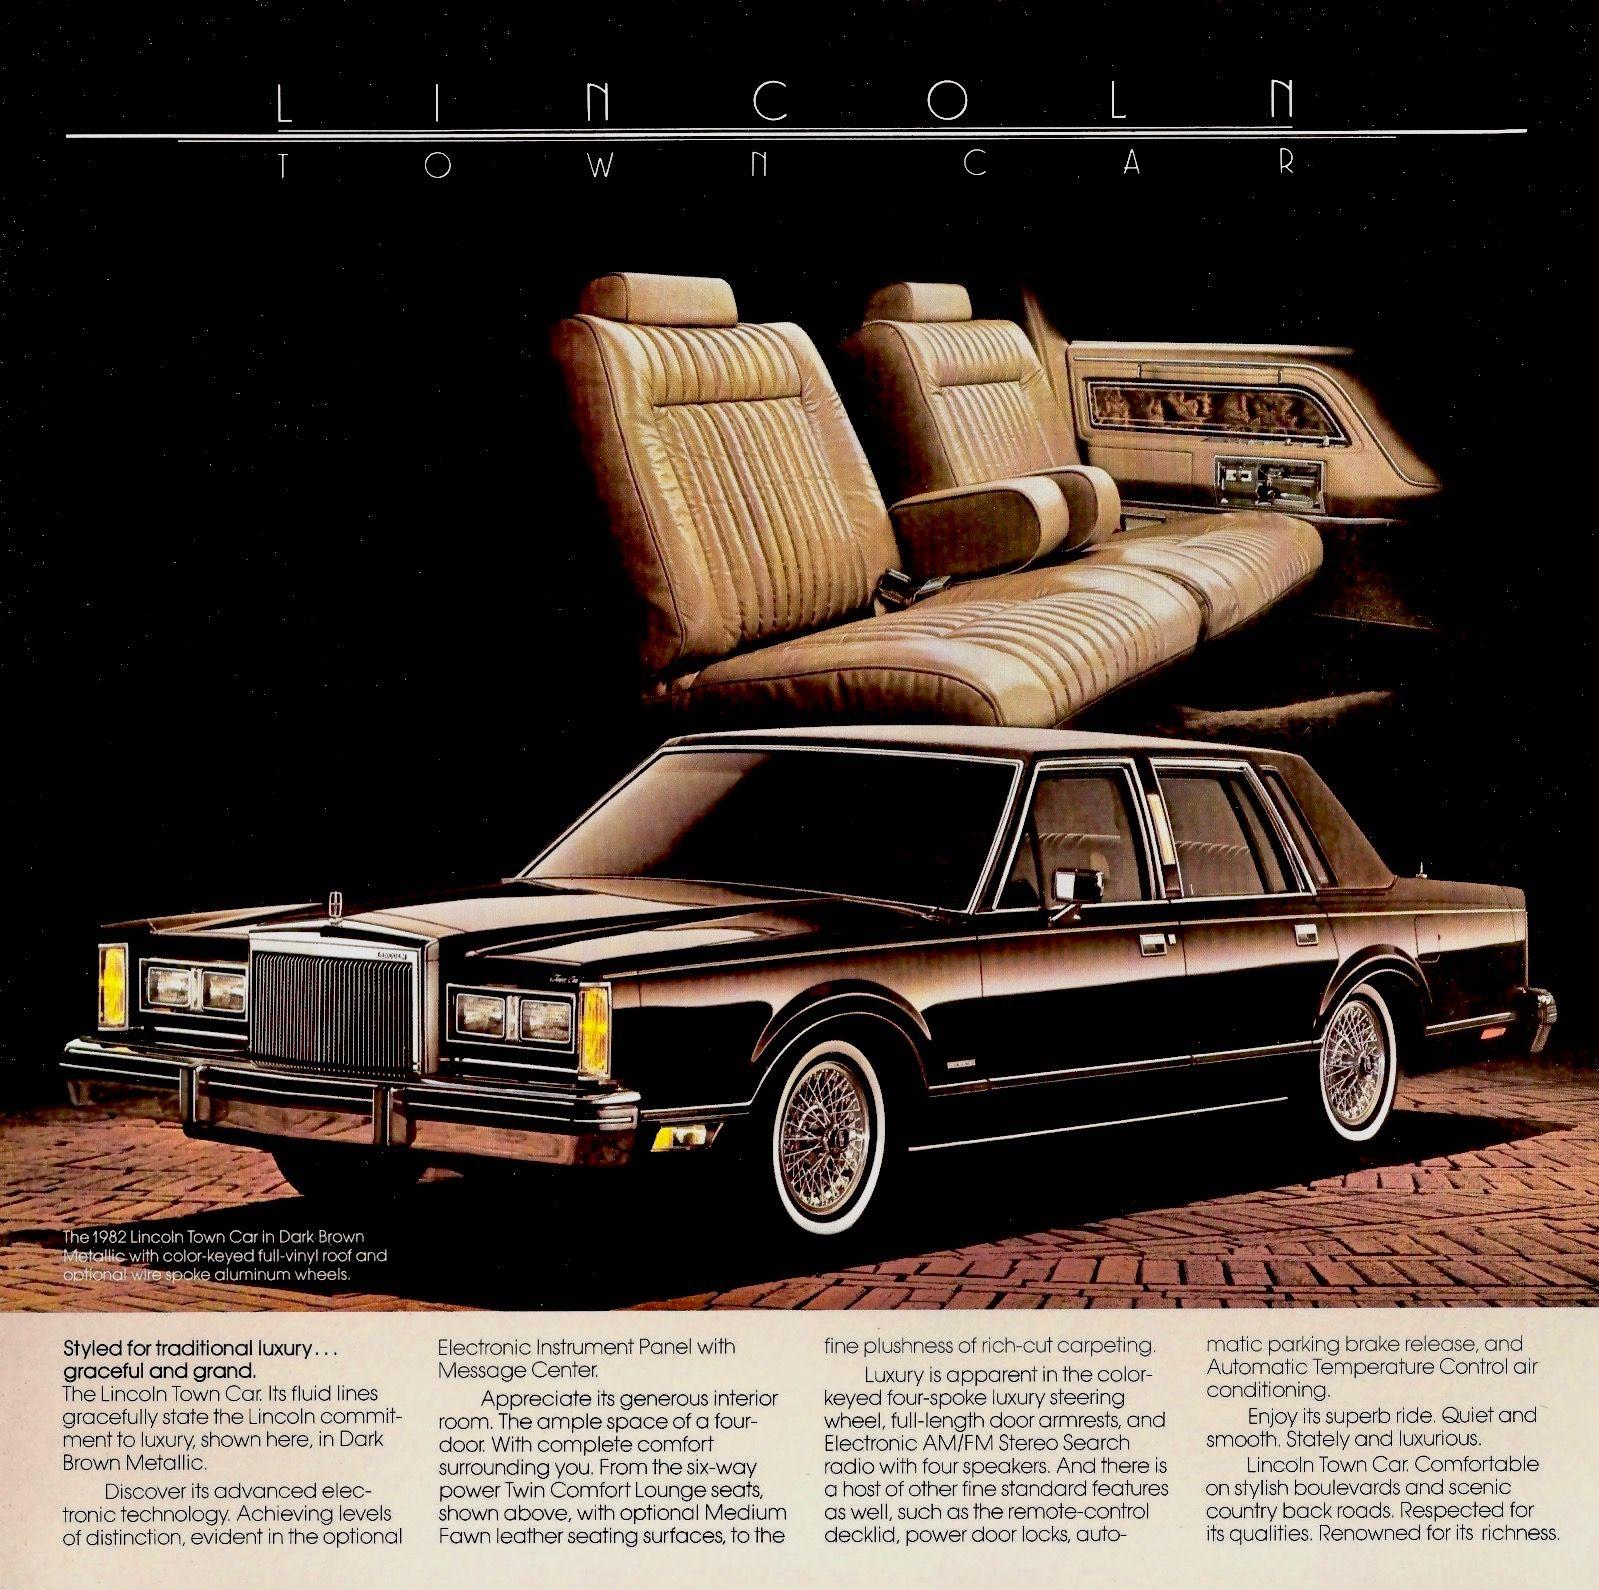 1982 Lincoln Town Car Lincoln Town Car Lincoln Motor Company Lincoln Cars